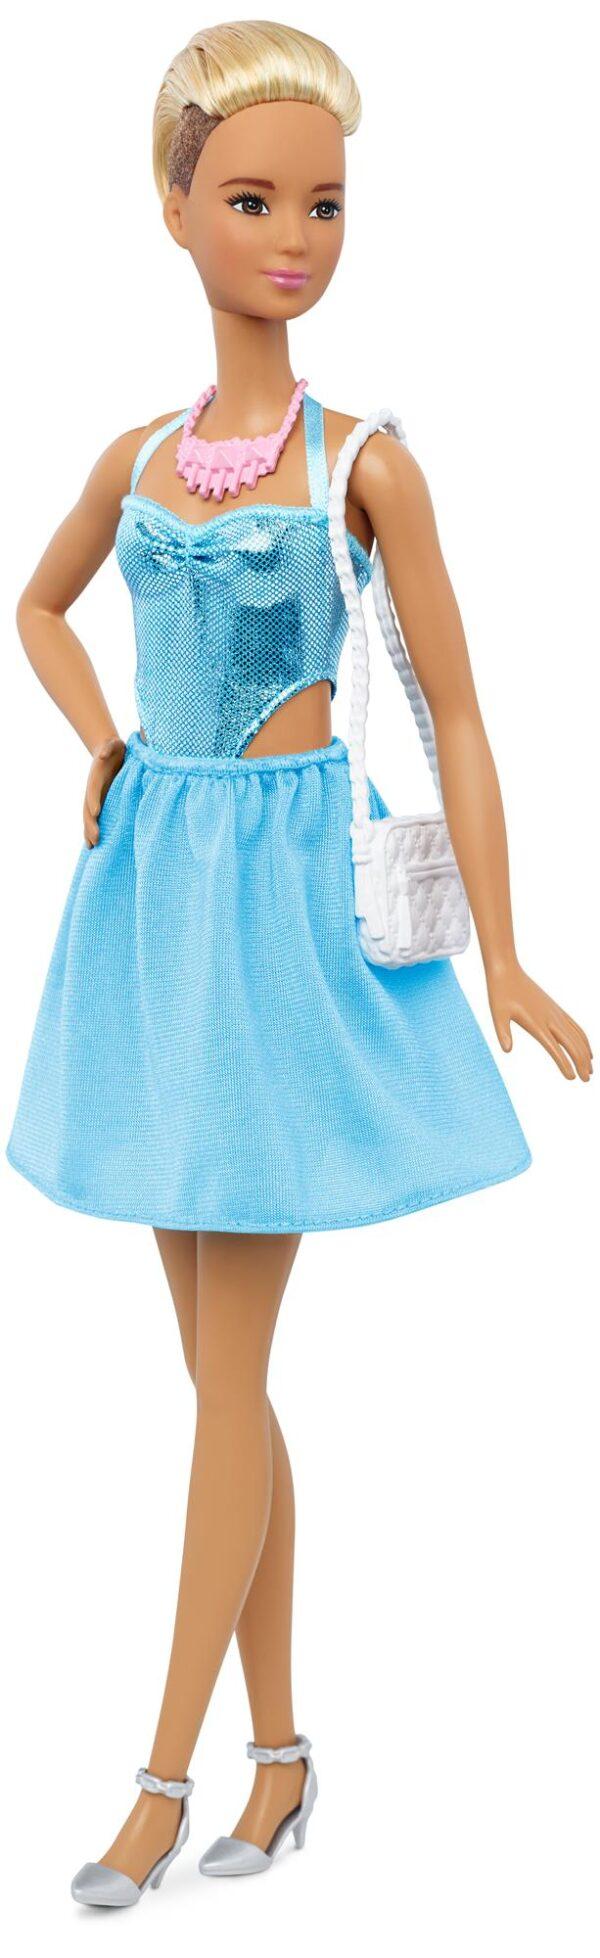 Barbie ALTRI Barbie  - Bambola Fashionista e Moda - Love Pizza Femmina 12-36 Mesi, 12+ Anni, 3-5 Anni, 5-8 Anni, 8-12 Anni